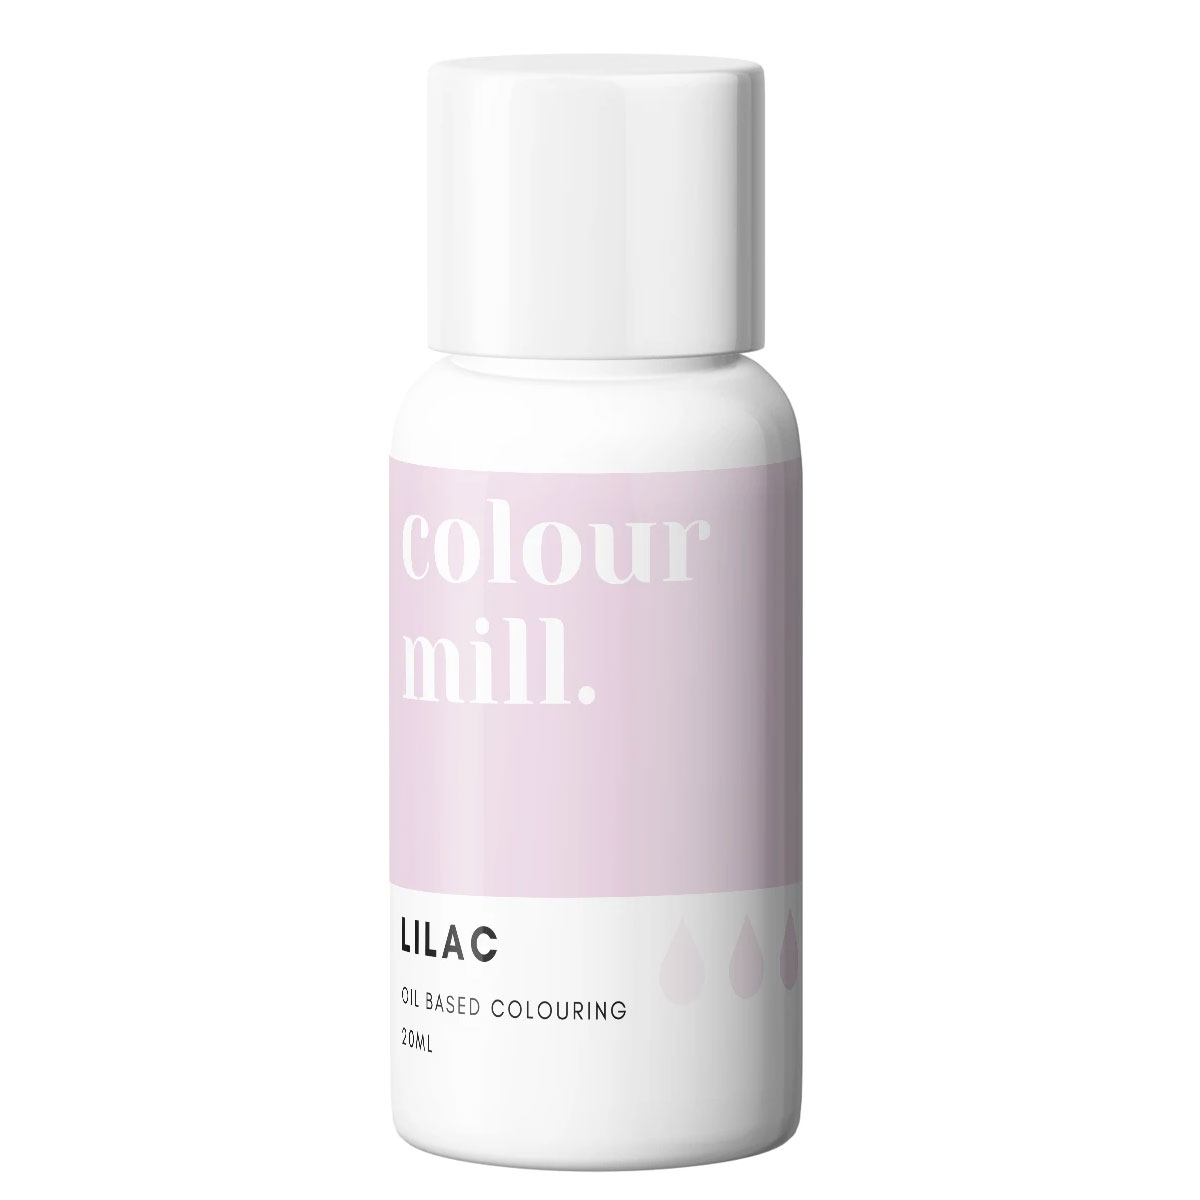 Colour Mill fettlösliche Lebensmittelfarbe - Lilac 20ml